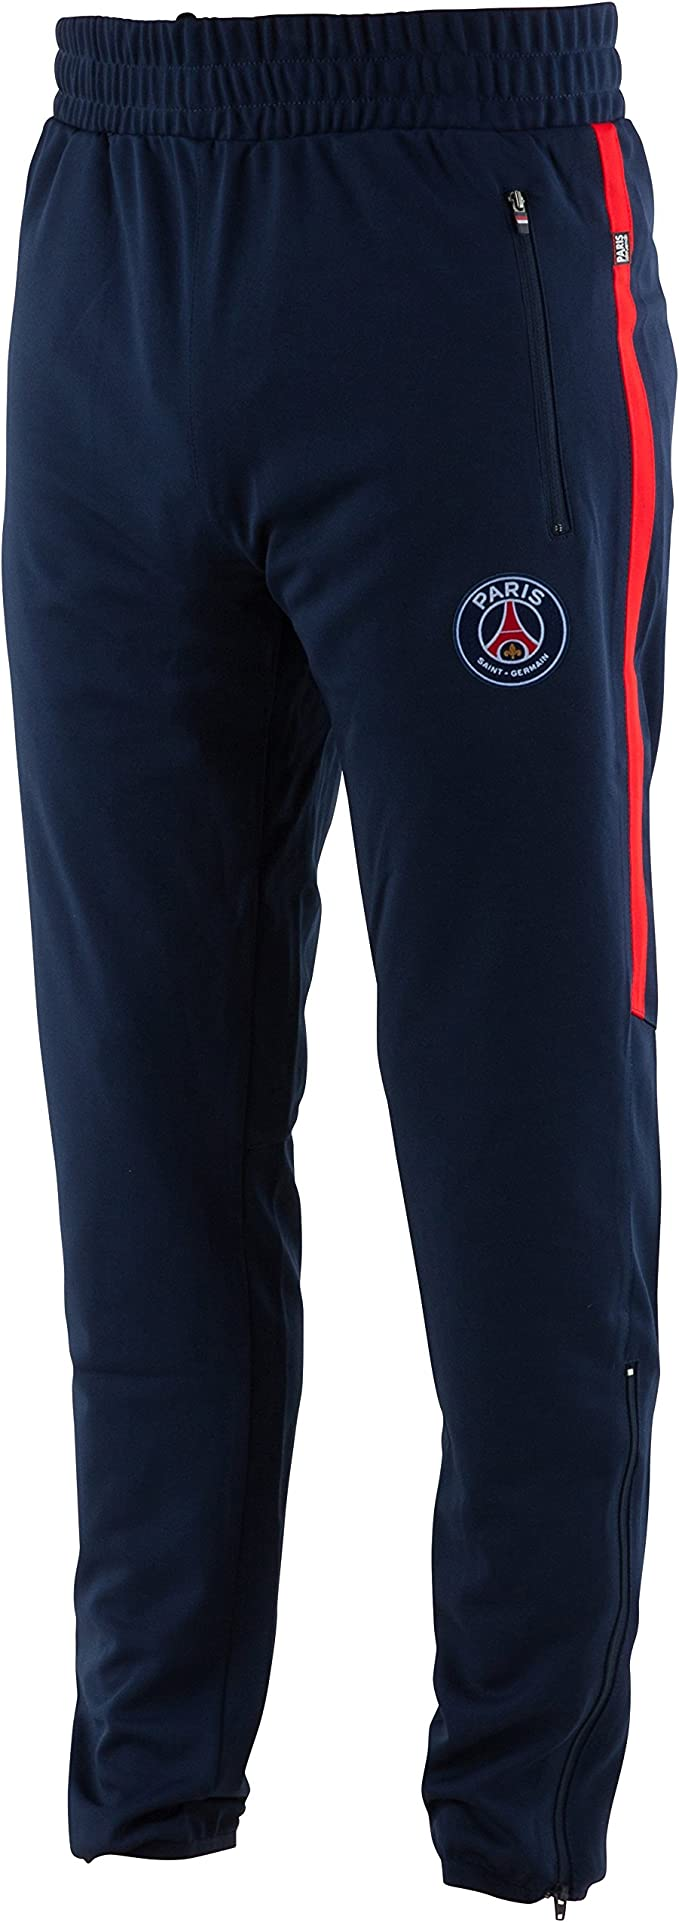 Paris Saint Germain - Pantaloni da tuta della squadra del Paris ...